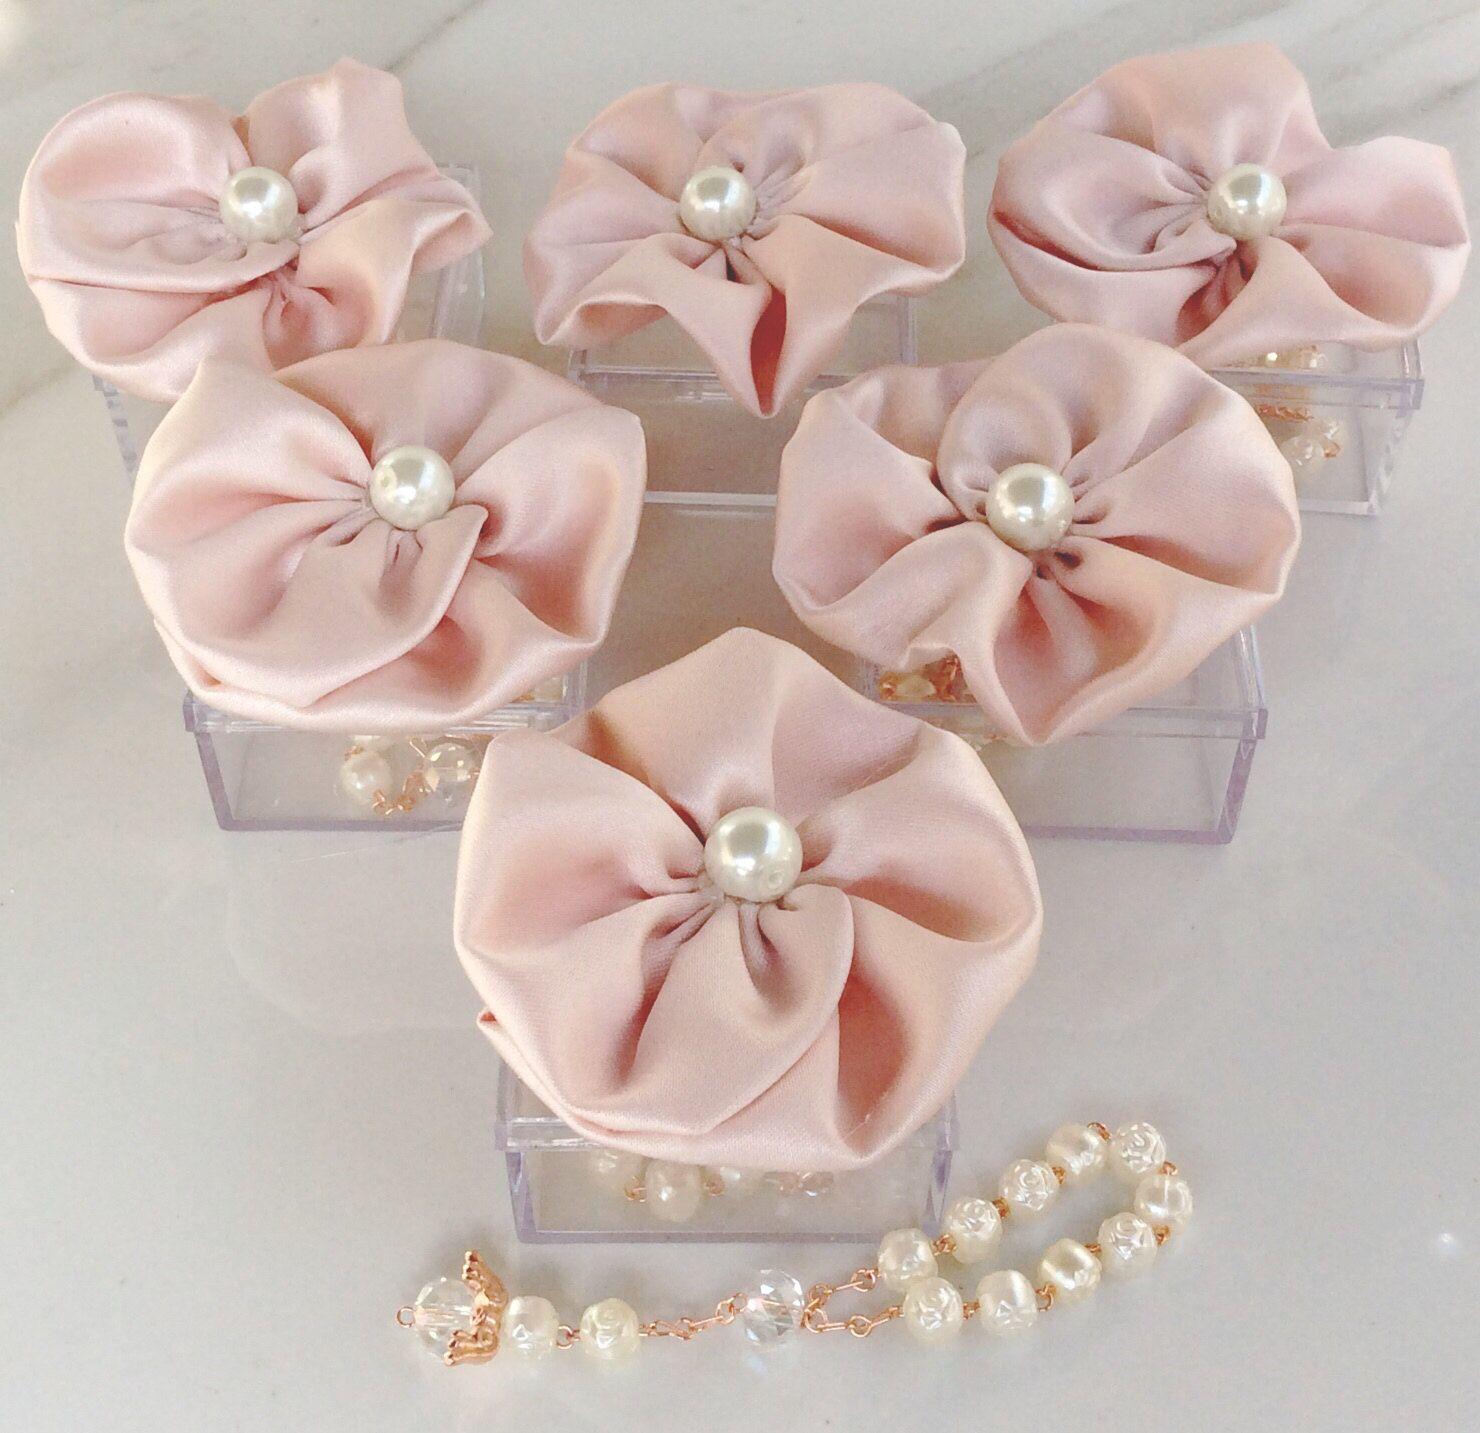 25pcs blush pink favors Wedding baptism Favor Box with Rosaries